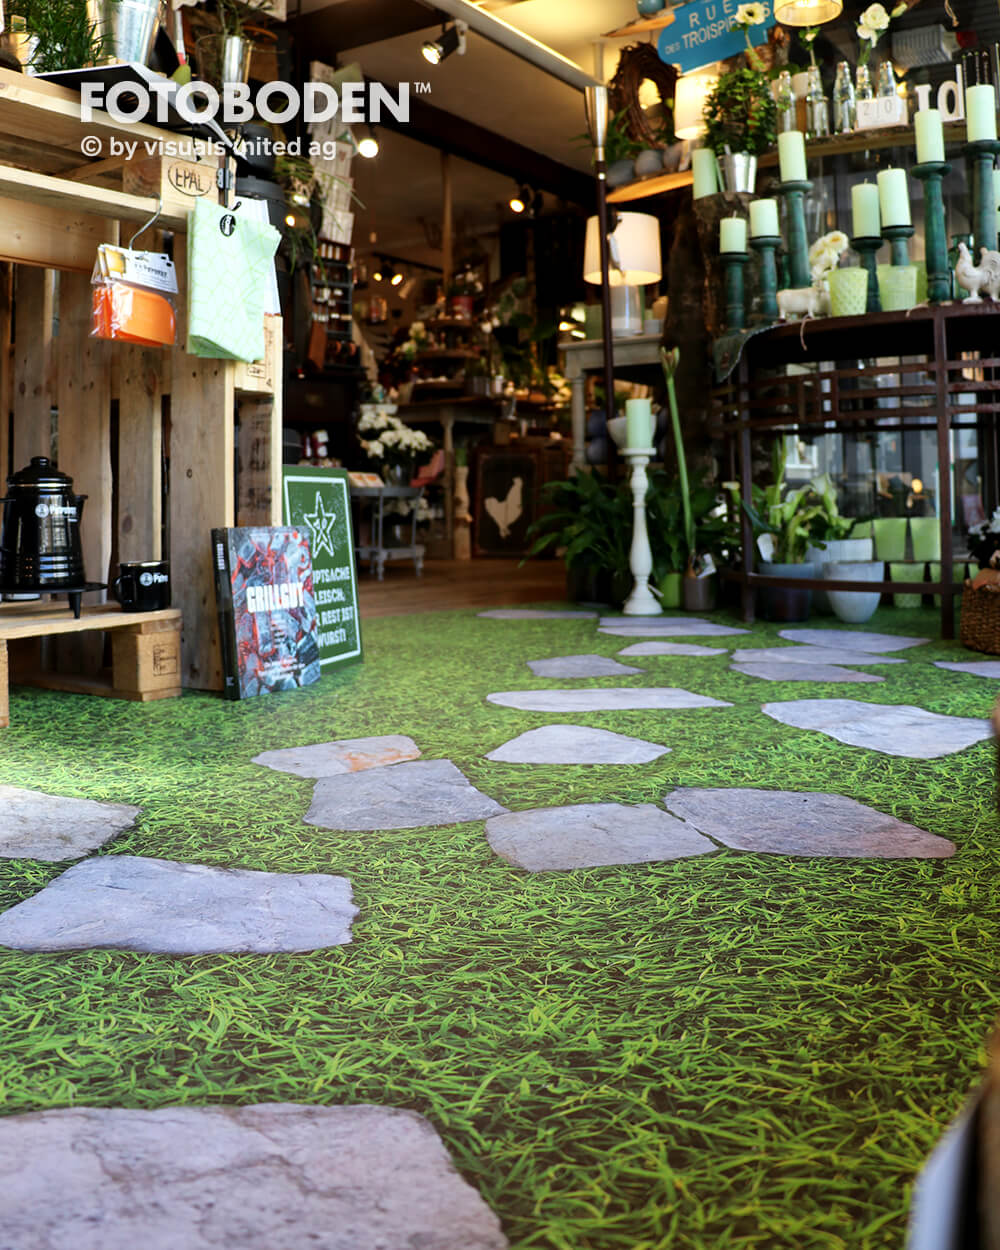 Stillmix Ladenbau Ladengestaltung Fußboden Verkaufsfläche Bodengestaltung Boden Foto Fotoboden Fotomotiv Motiv Druck Visual Merchandising Point Of Sale POS 1